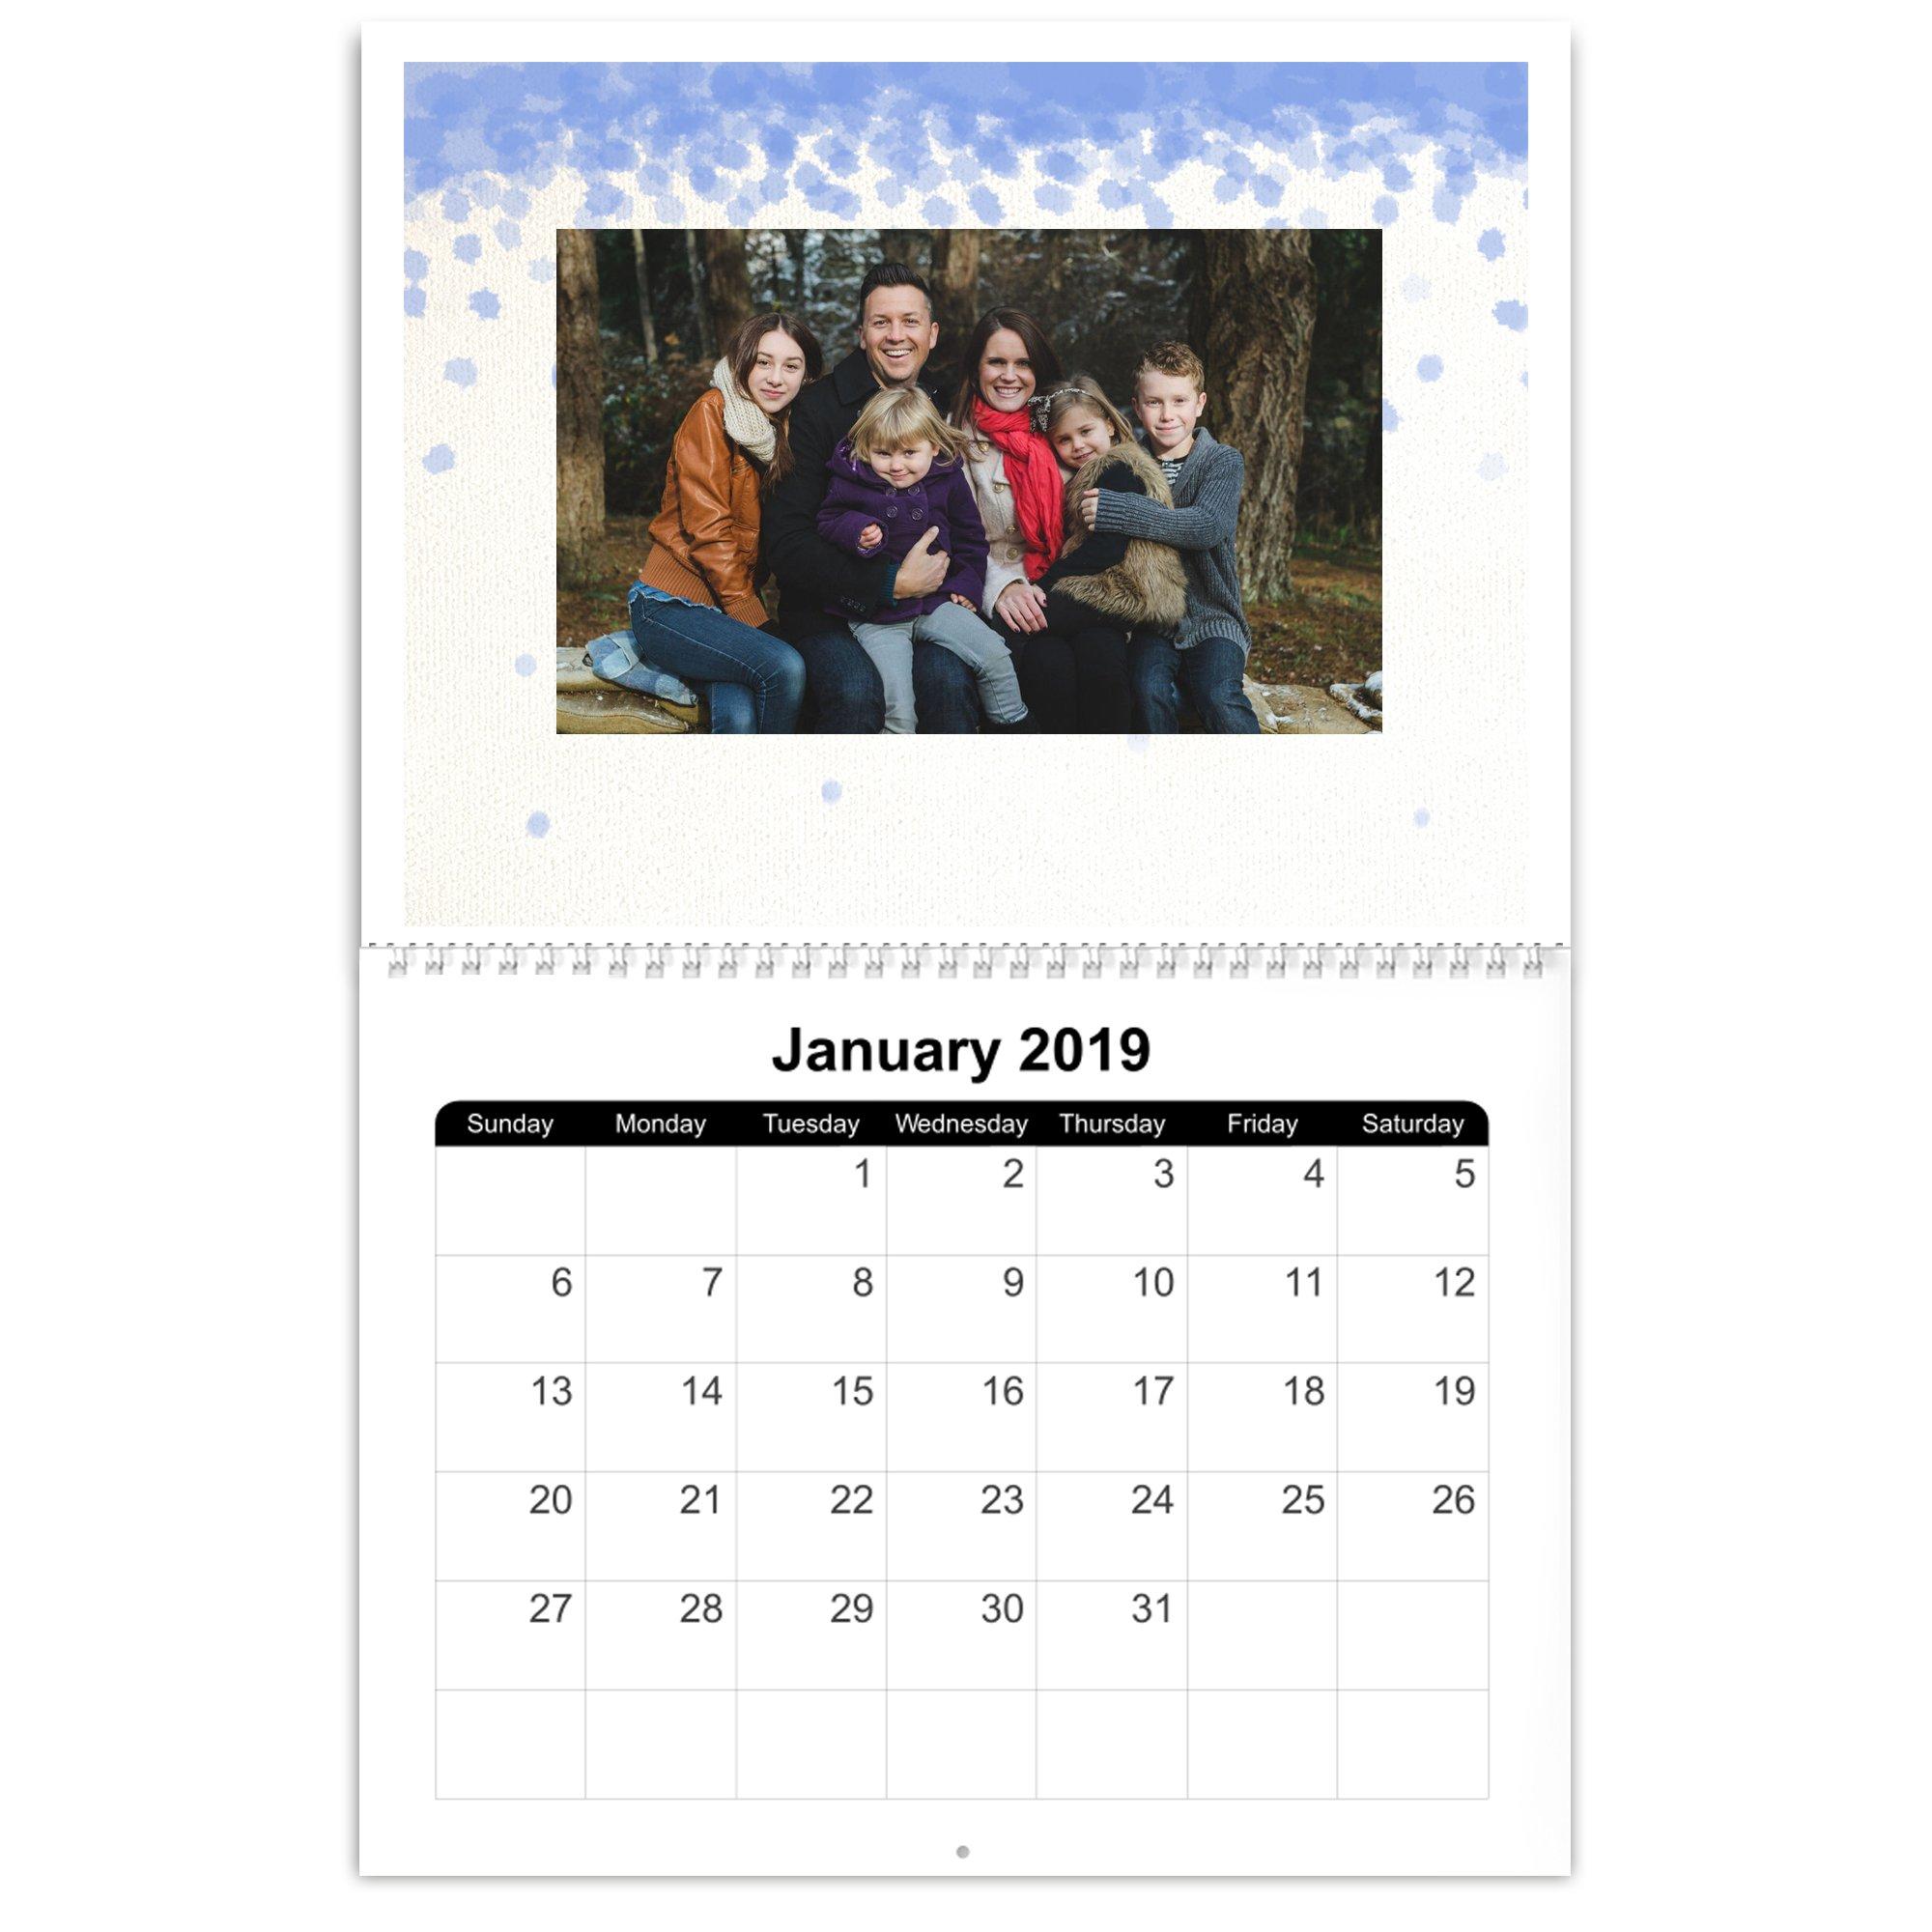 8x11 Photo Calendar, 12 Month